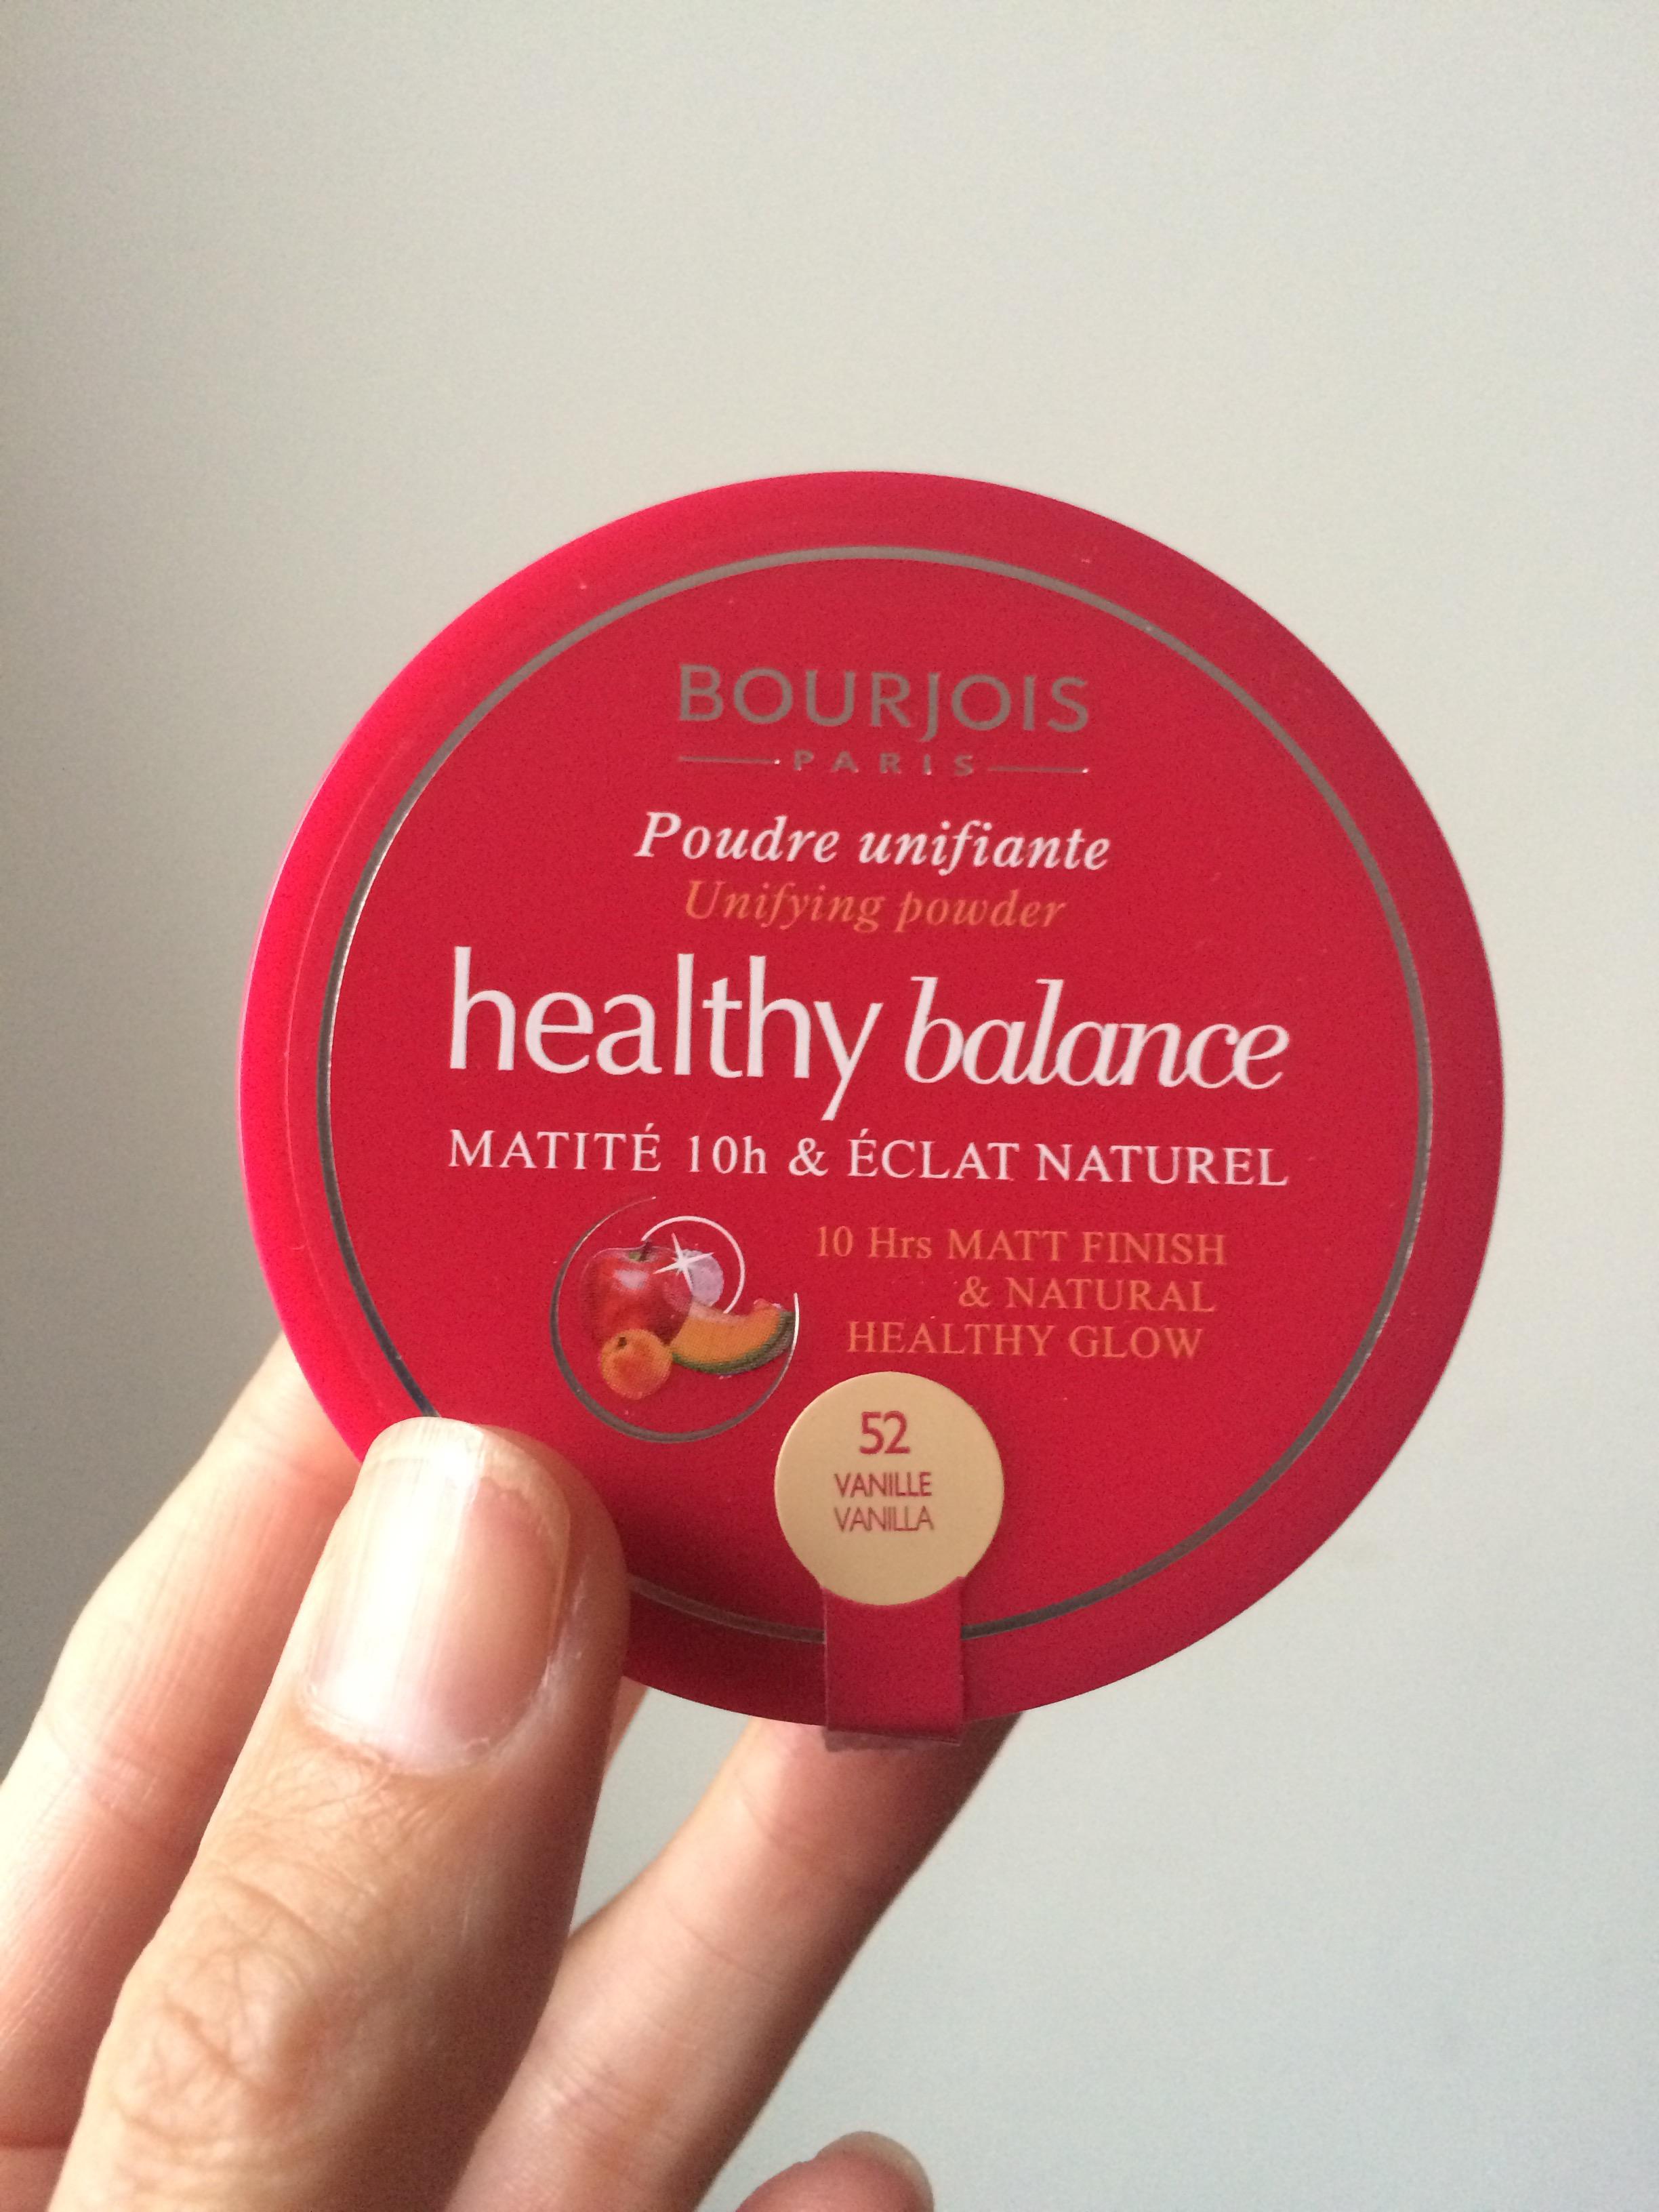 how to use powder makeup tutorial bourjois  healrhy balence